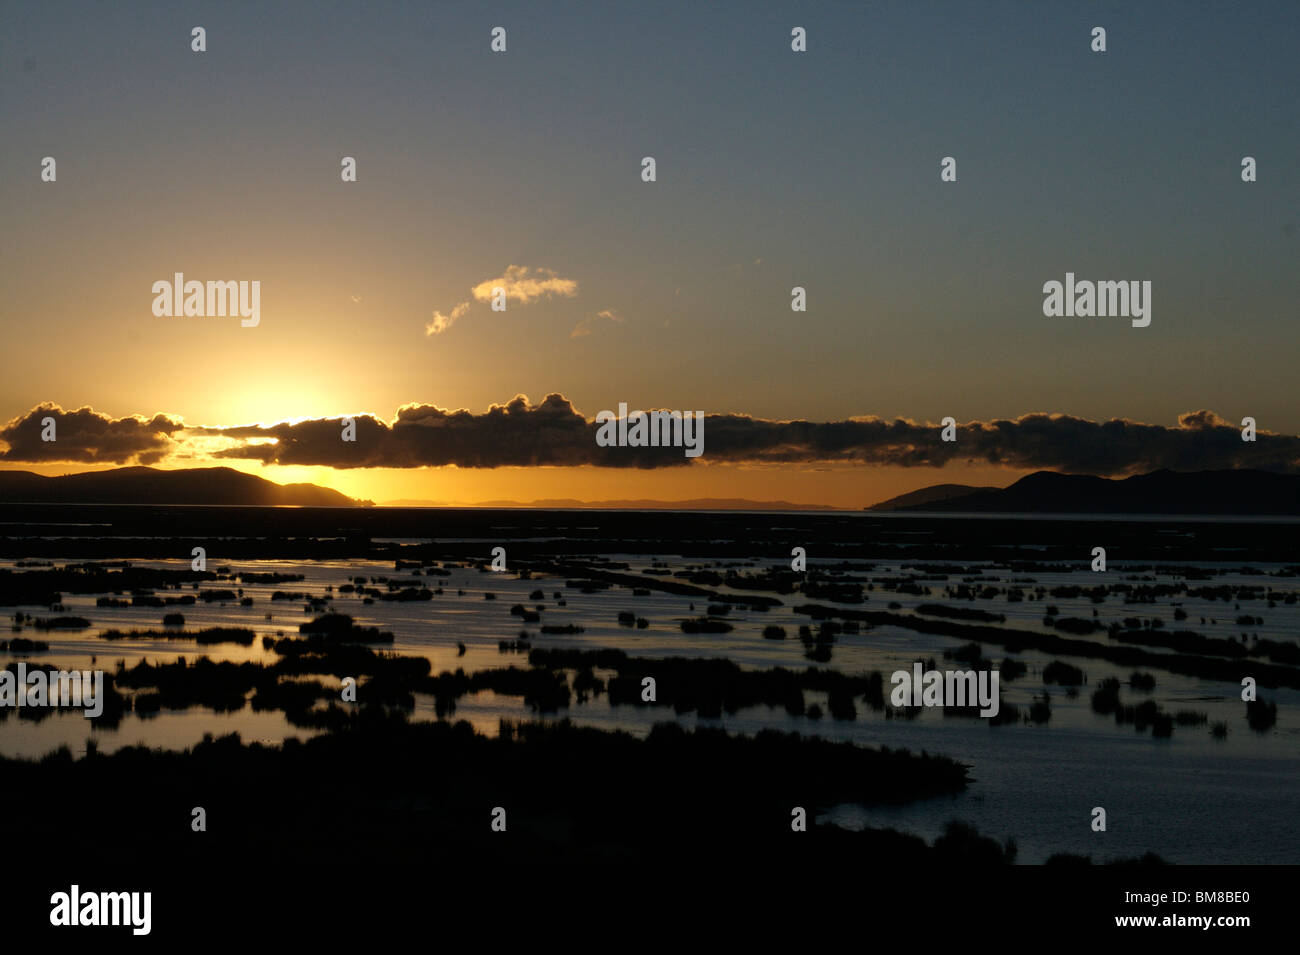 Dawn at Lake Titicaca, viewed from Hotel Libertador, Puno, Peru - Stock Image